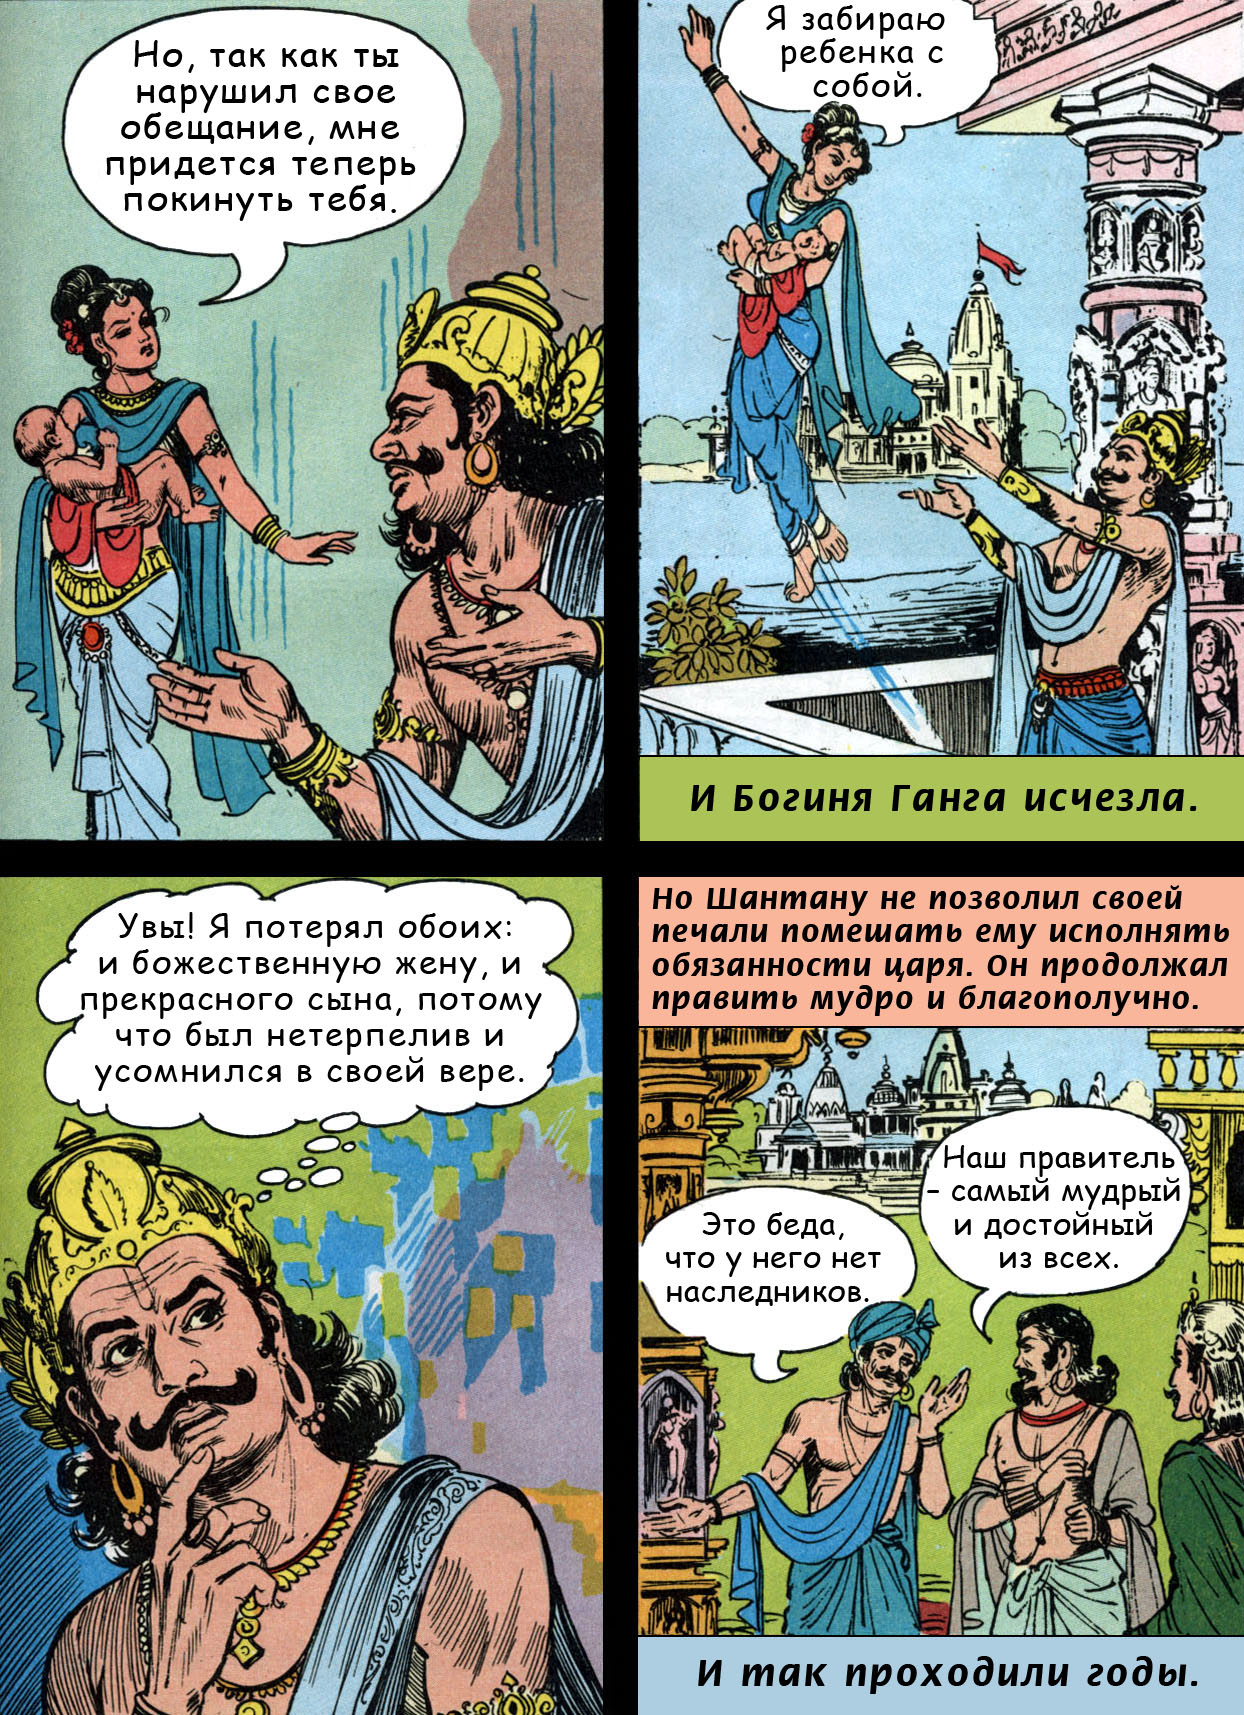 Бхишма 05 - ведический комикс